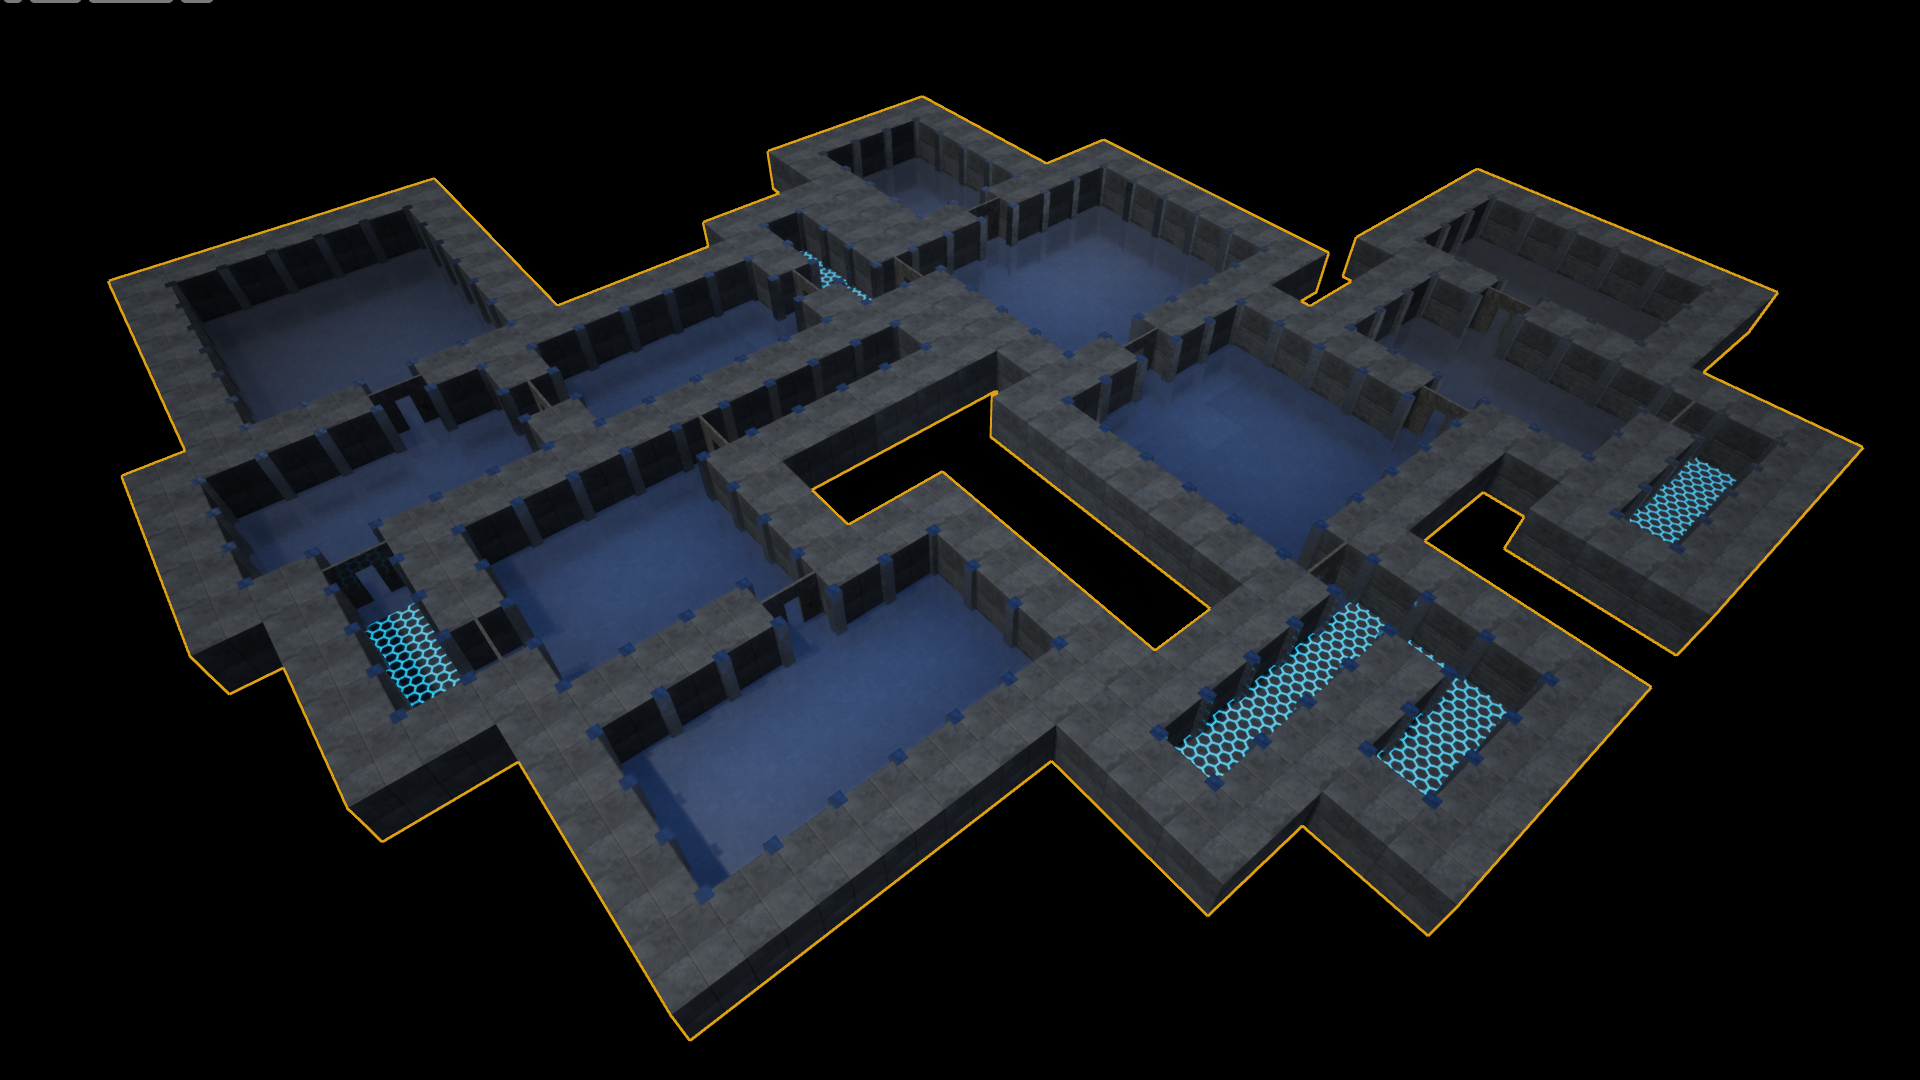 Procedural Dungeon Map Builder by Ripen in Blueprints - UE4